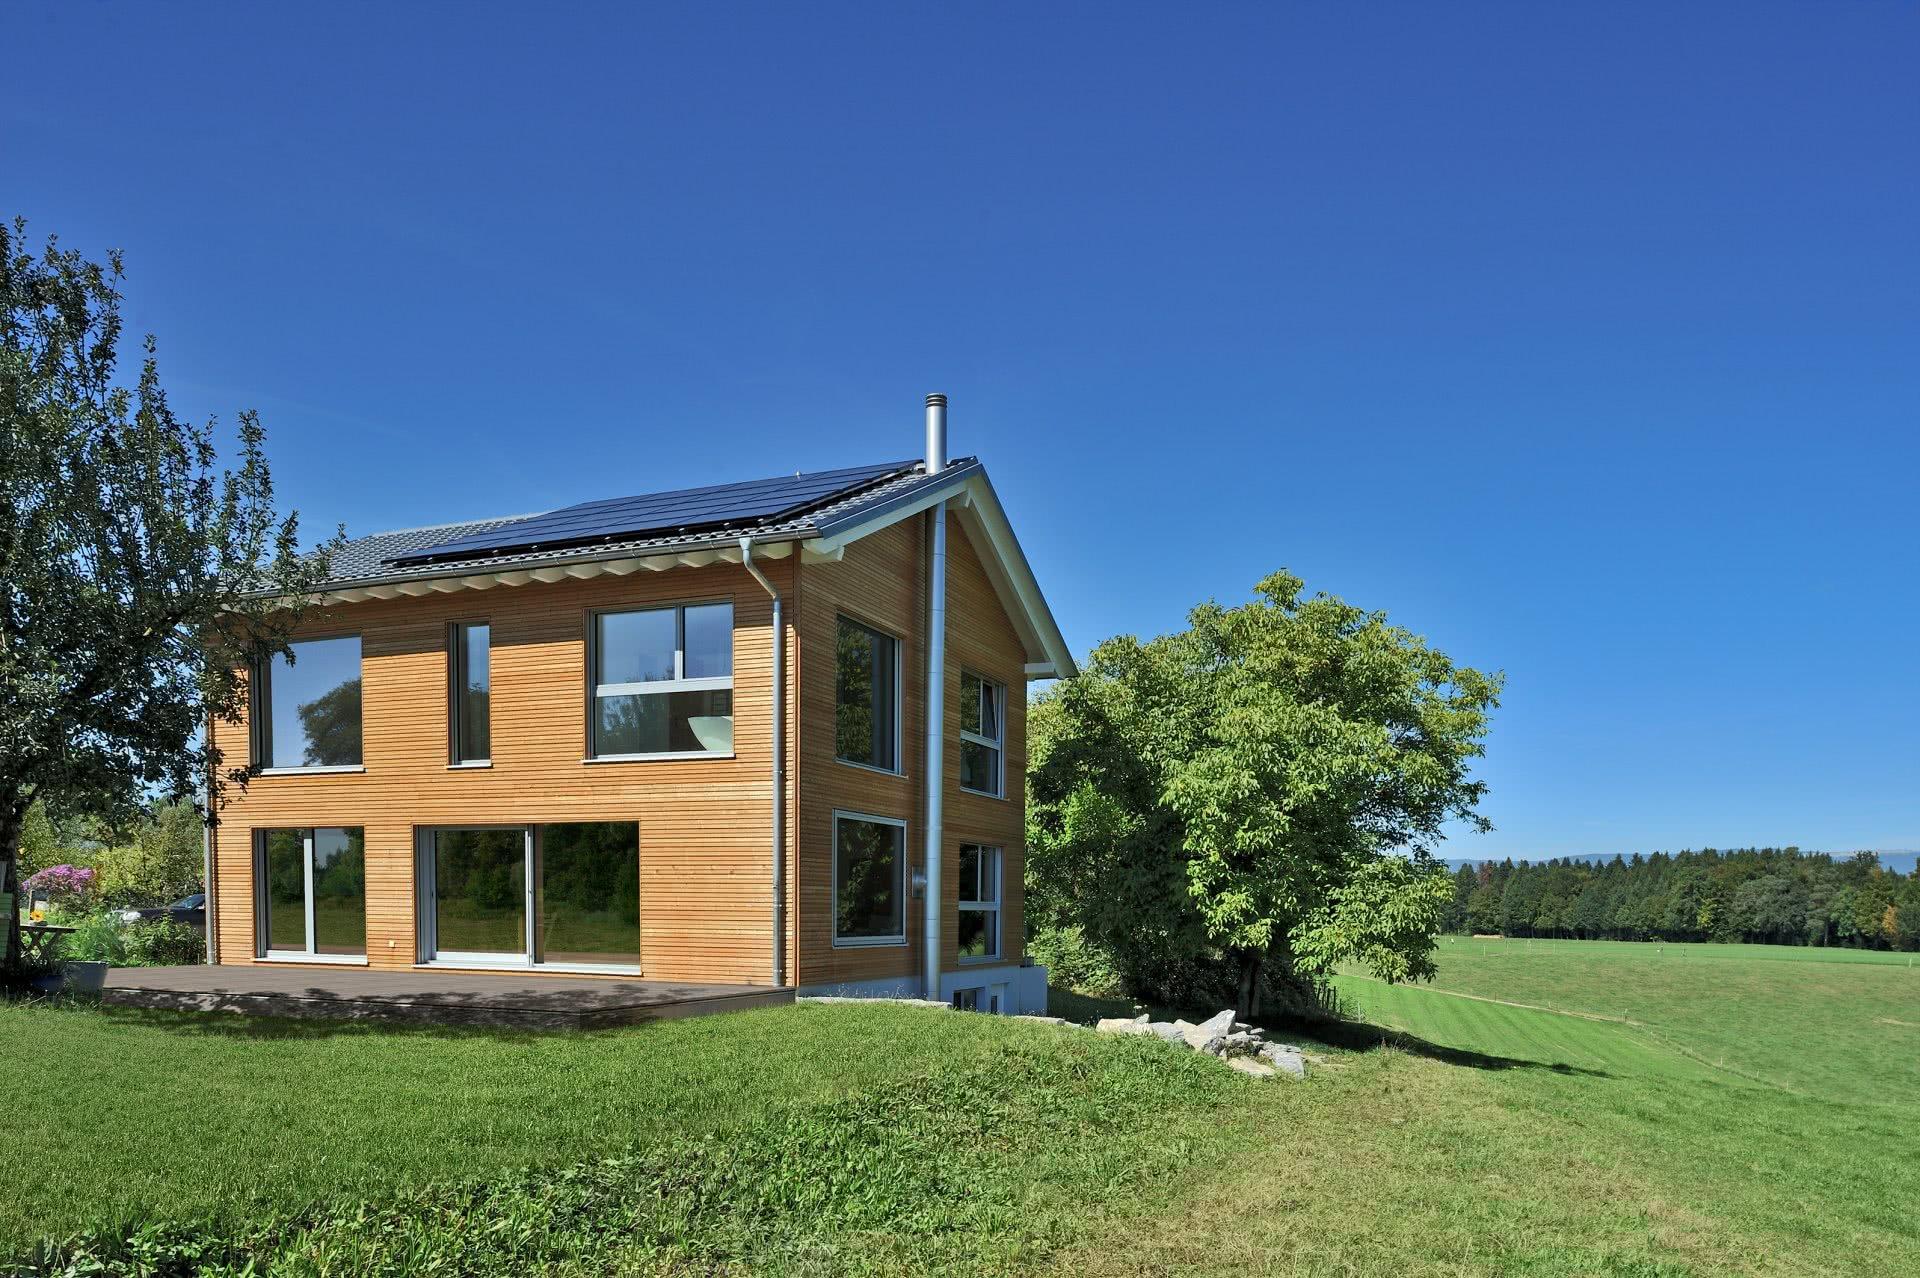 Nachhaltiger Hausbau